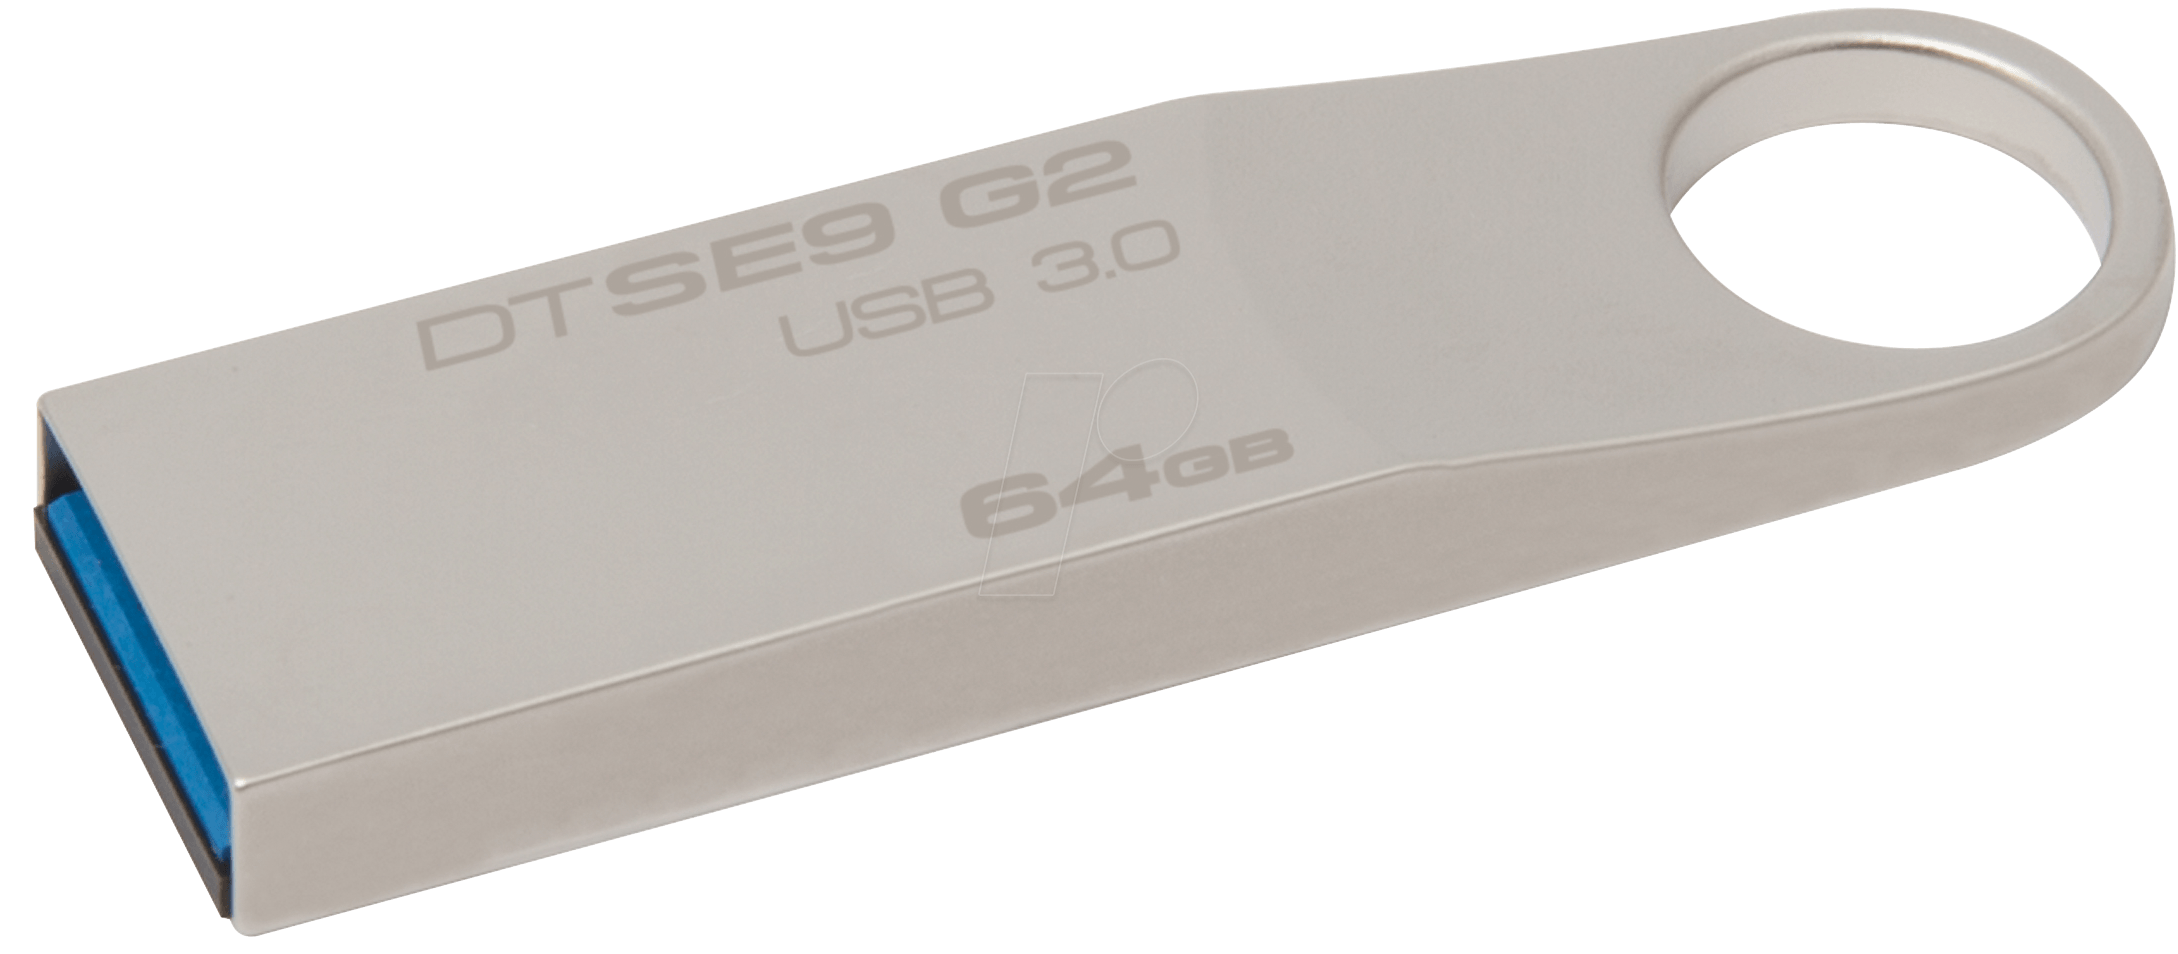 dtse9g2 64gb datatraveler se9 g2 usb 3 0 stick 64gb at. Black Bedroom Furniture Sets. Home Design Ideas